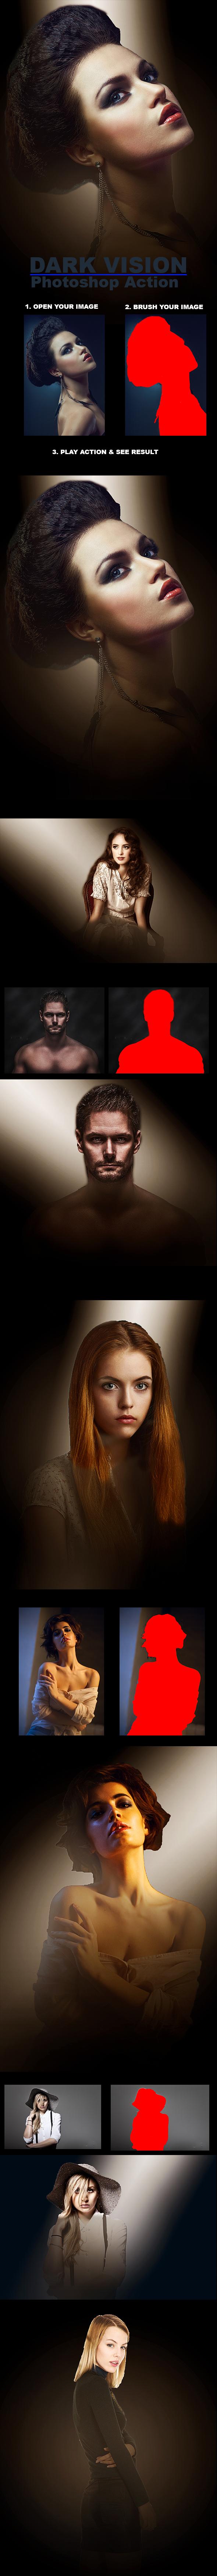 GraphicRiver Dark Vision Photoshop Action 21085148